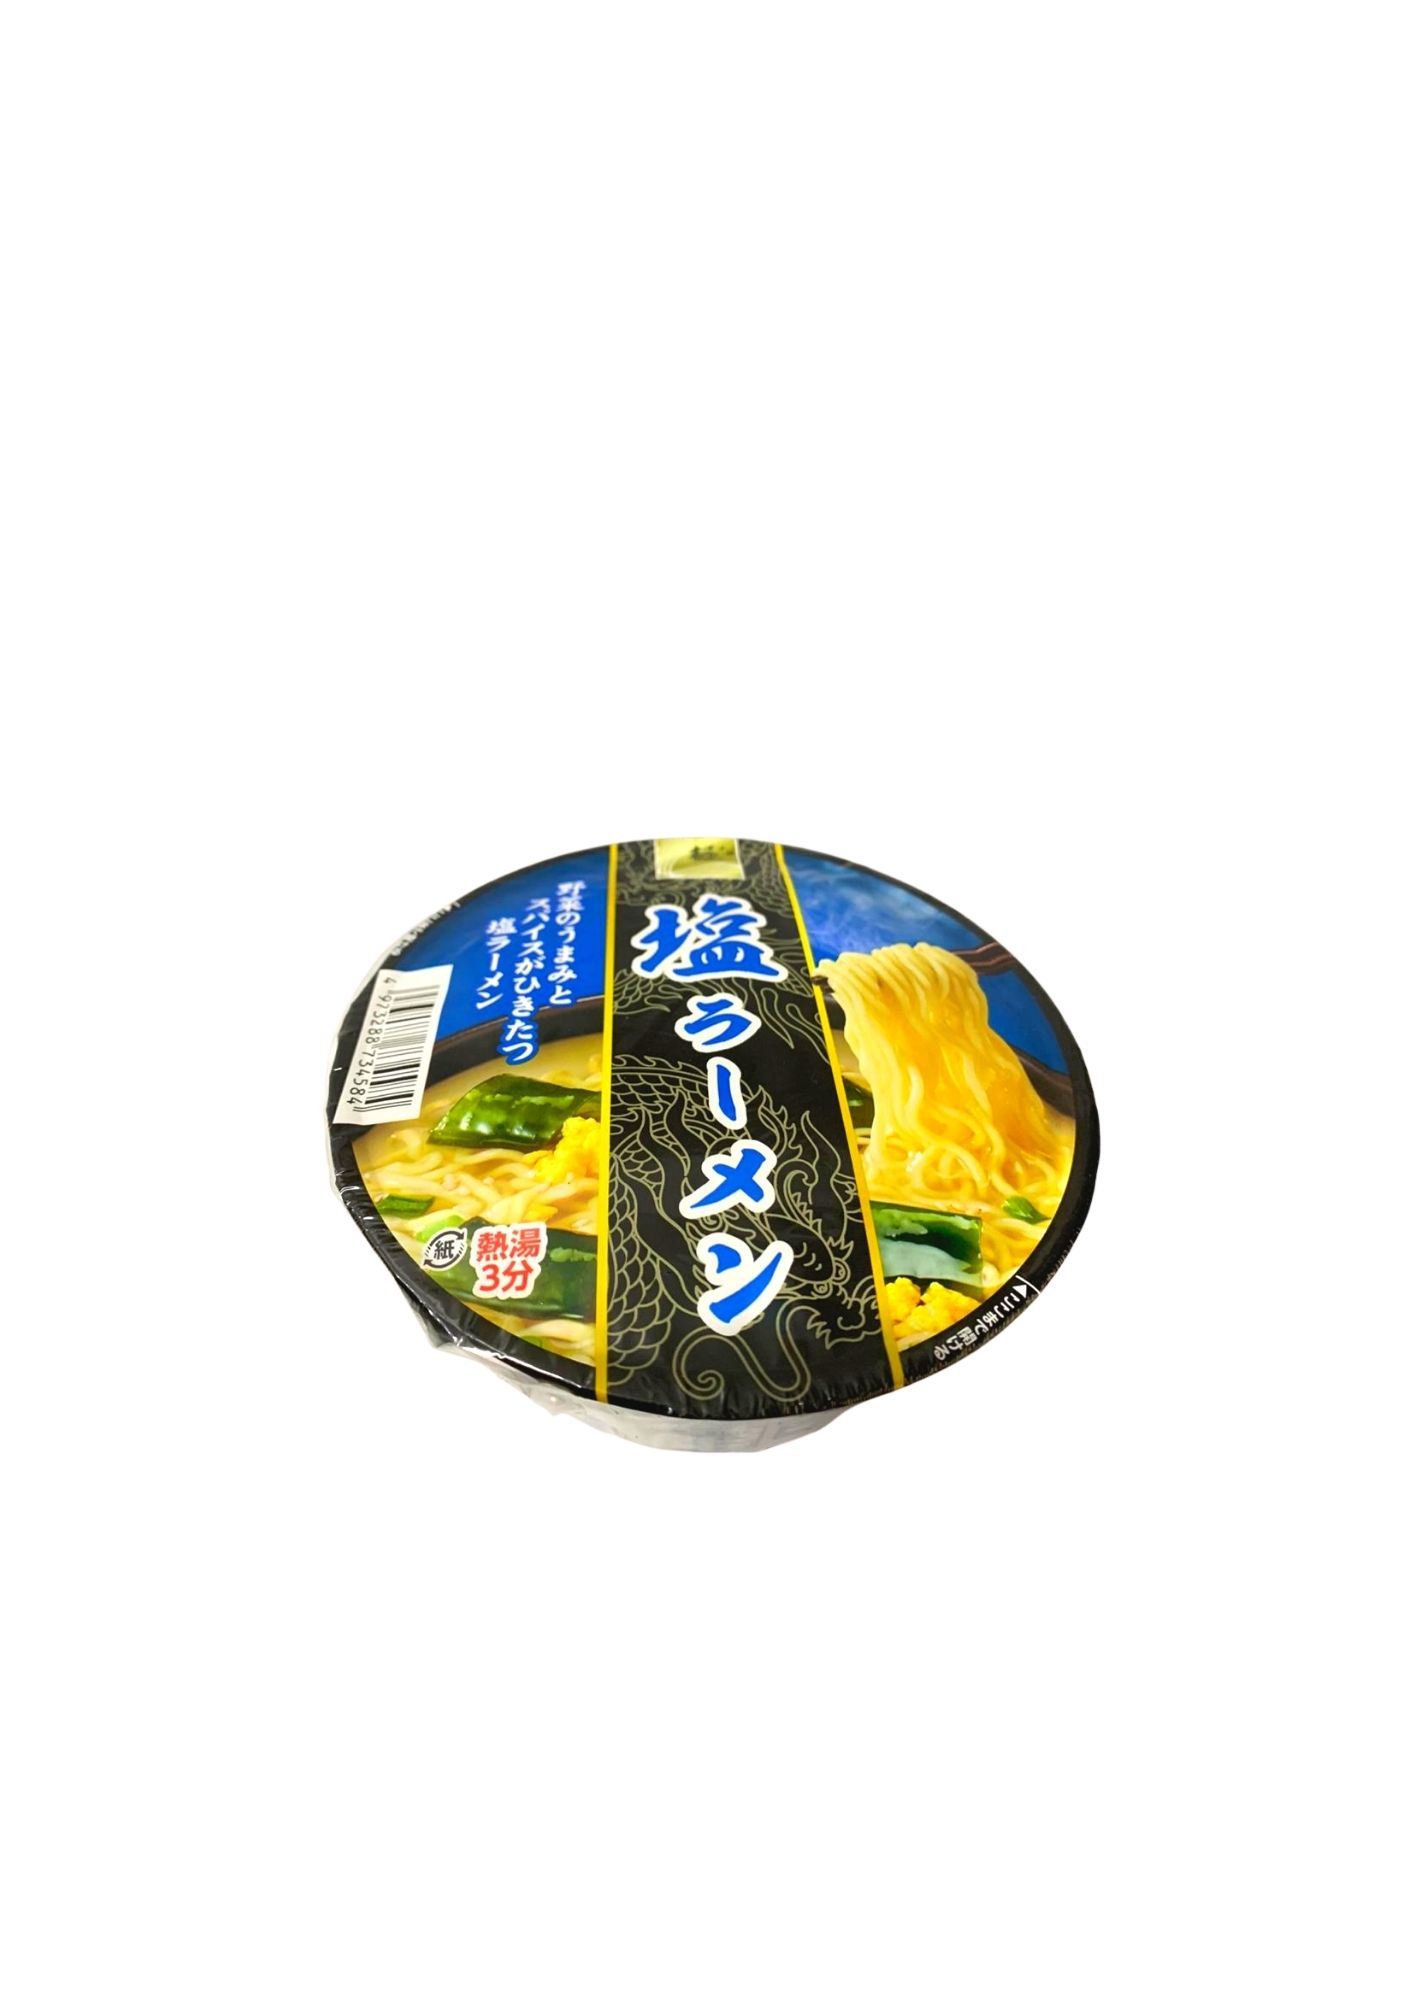 SUNAOSHI CUP SHIO LAMEN 79g